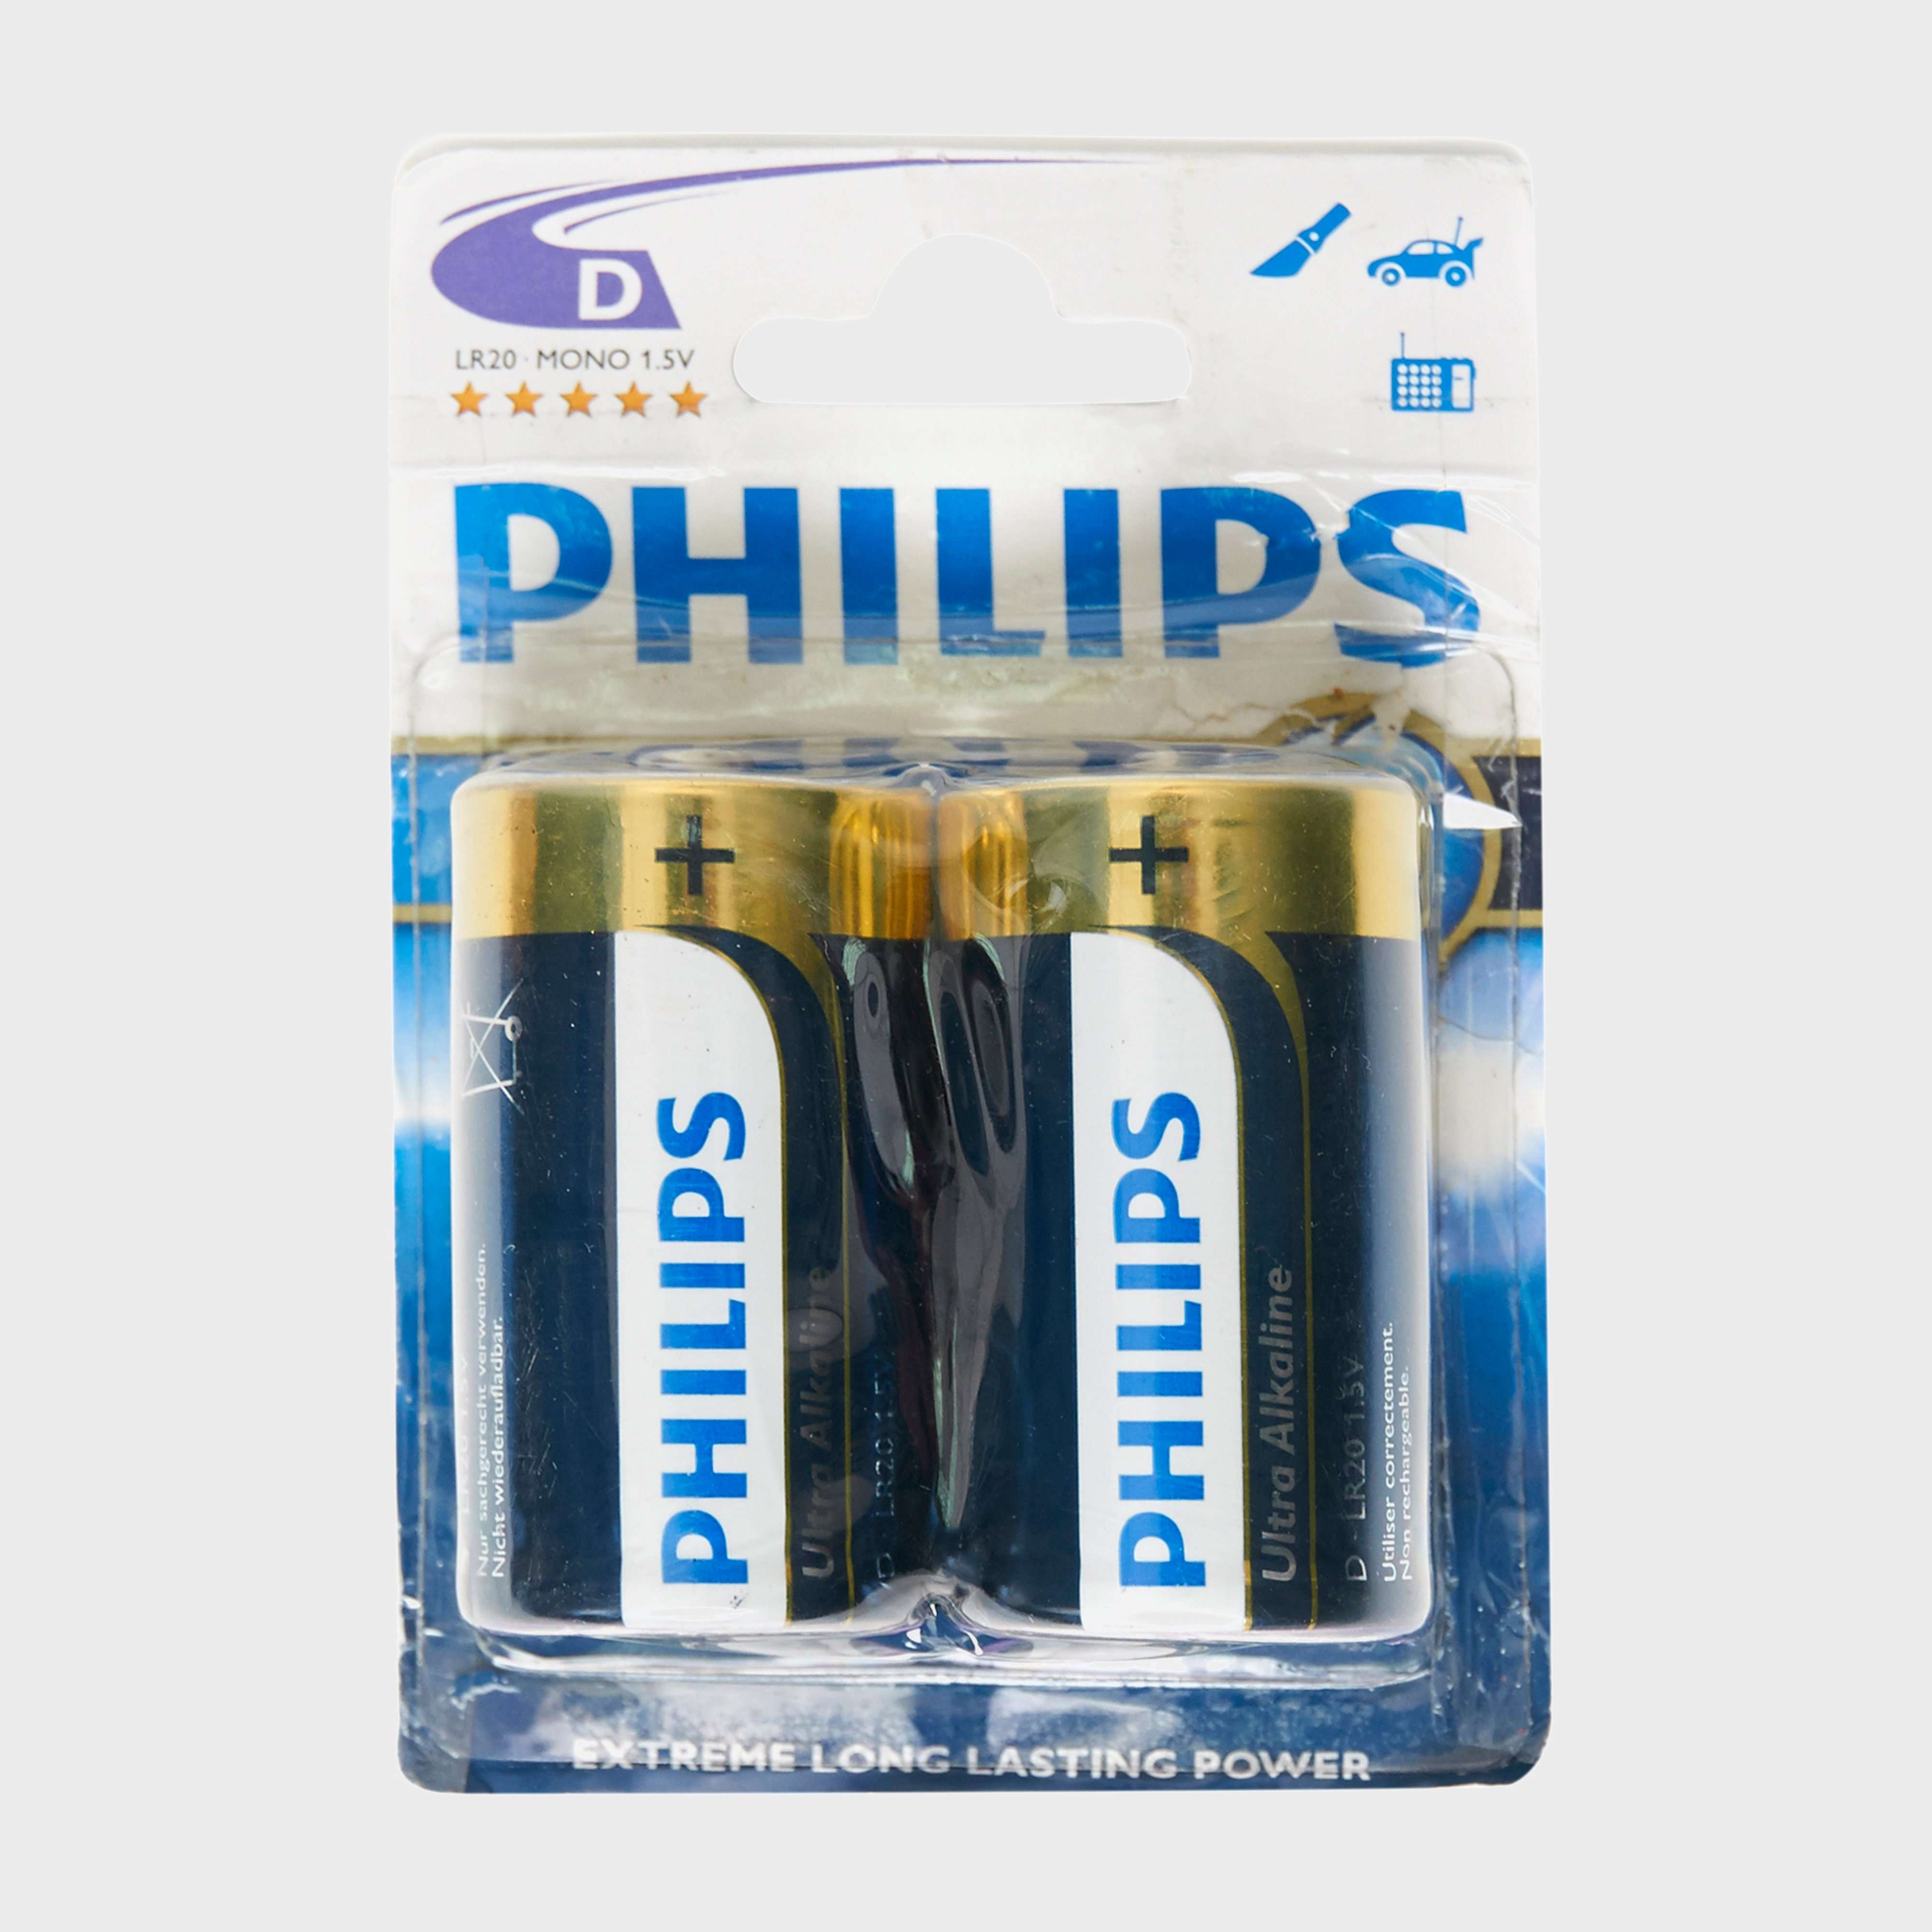 PHILLIPS Ultra Alkaline D LR20 Batteries 2 Pack